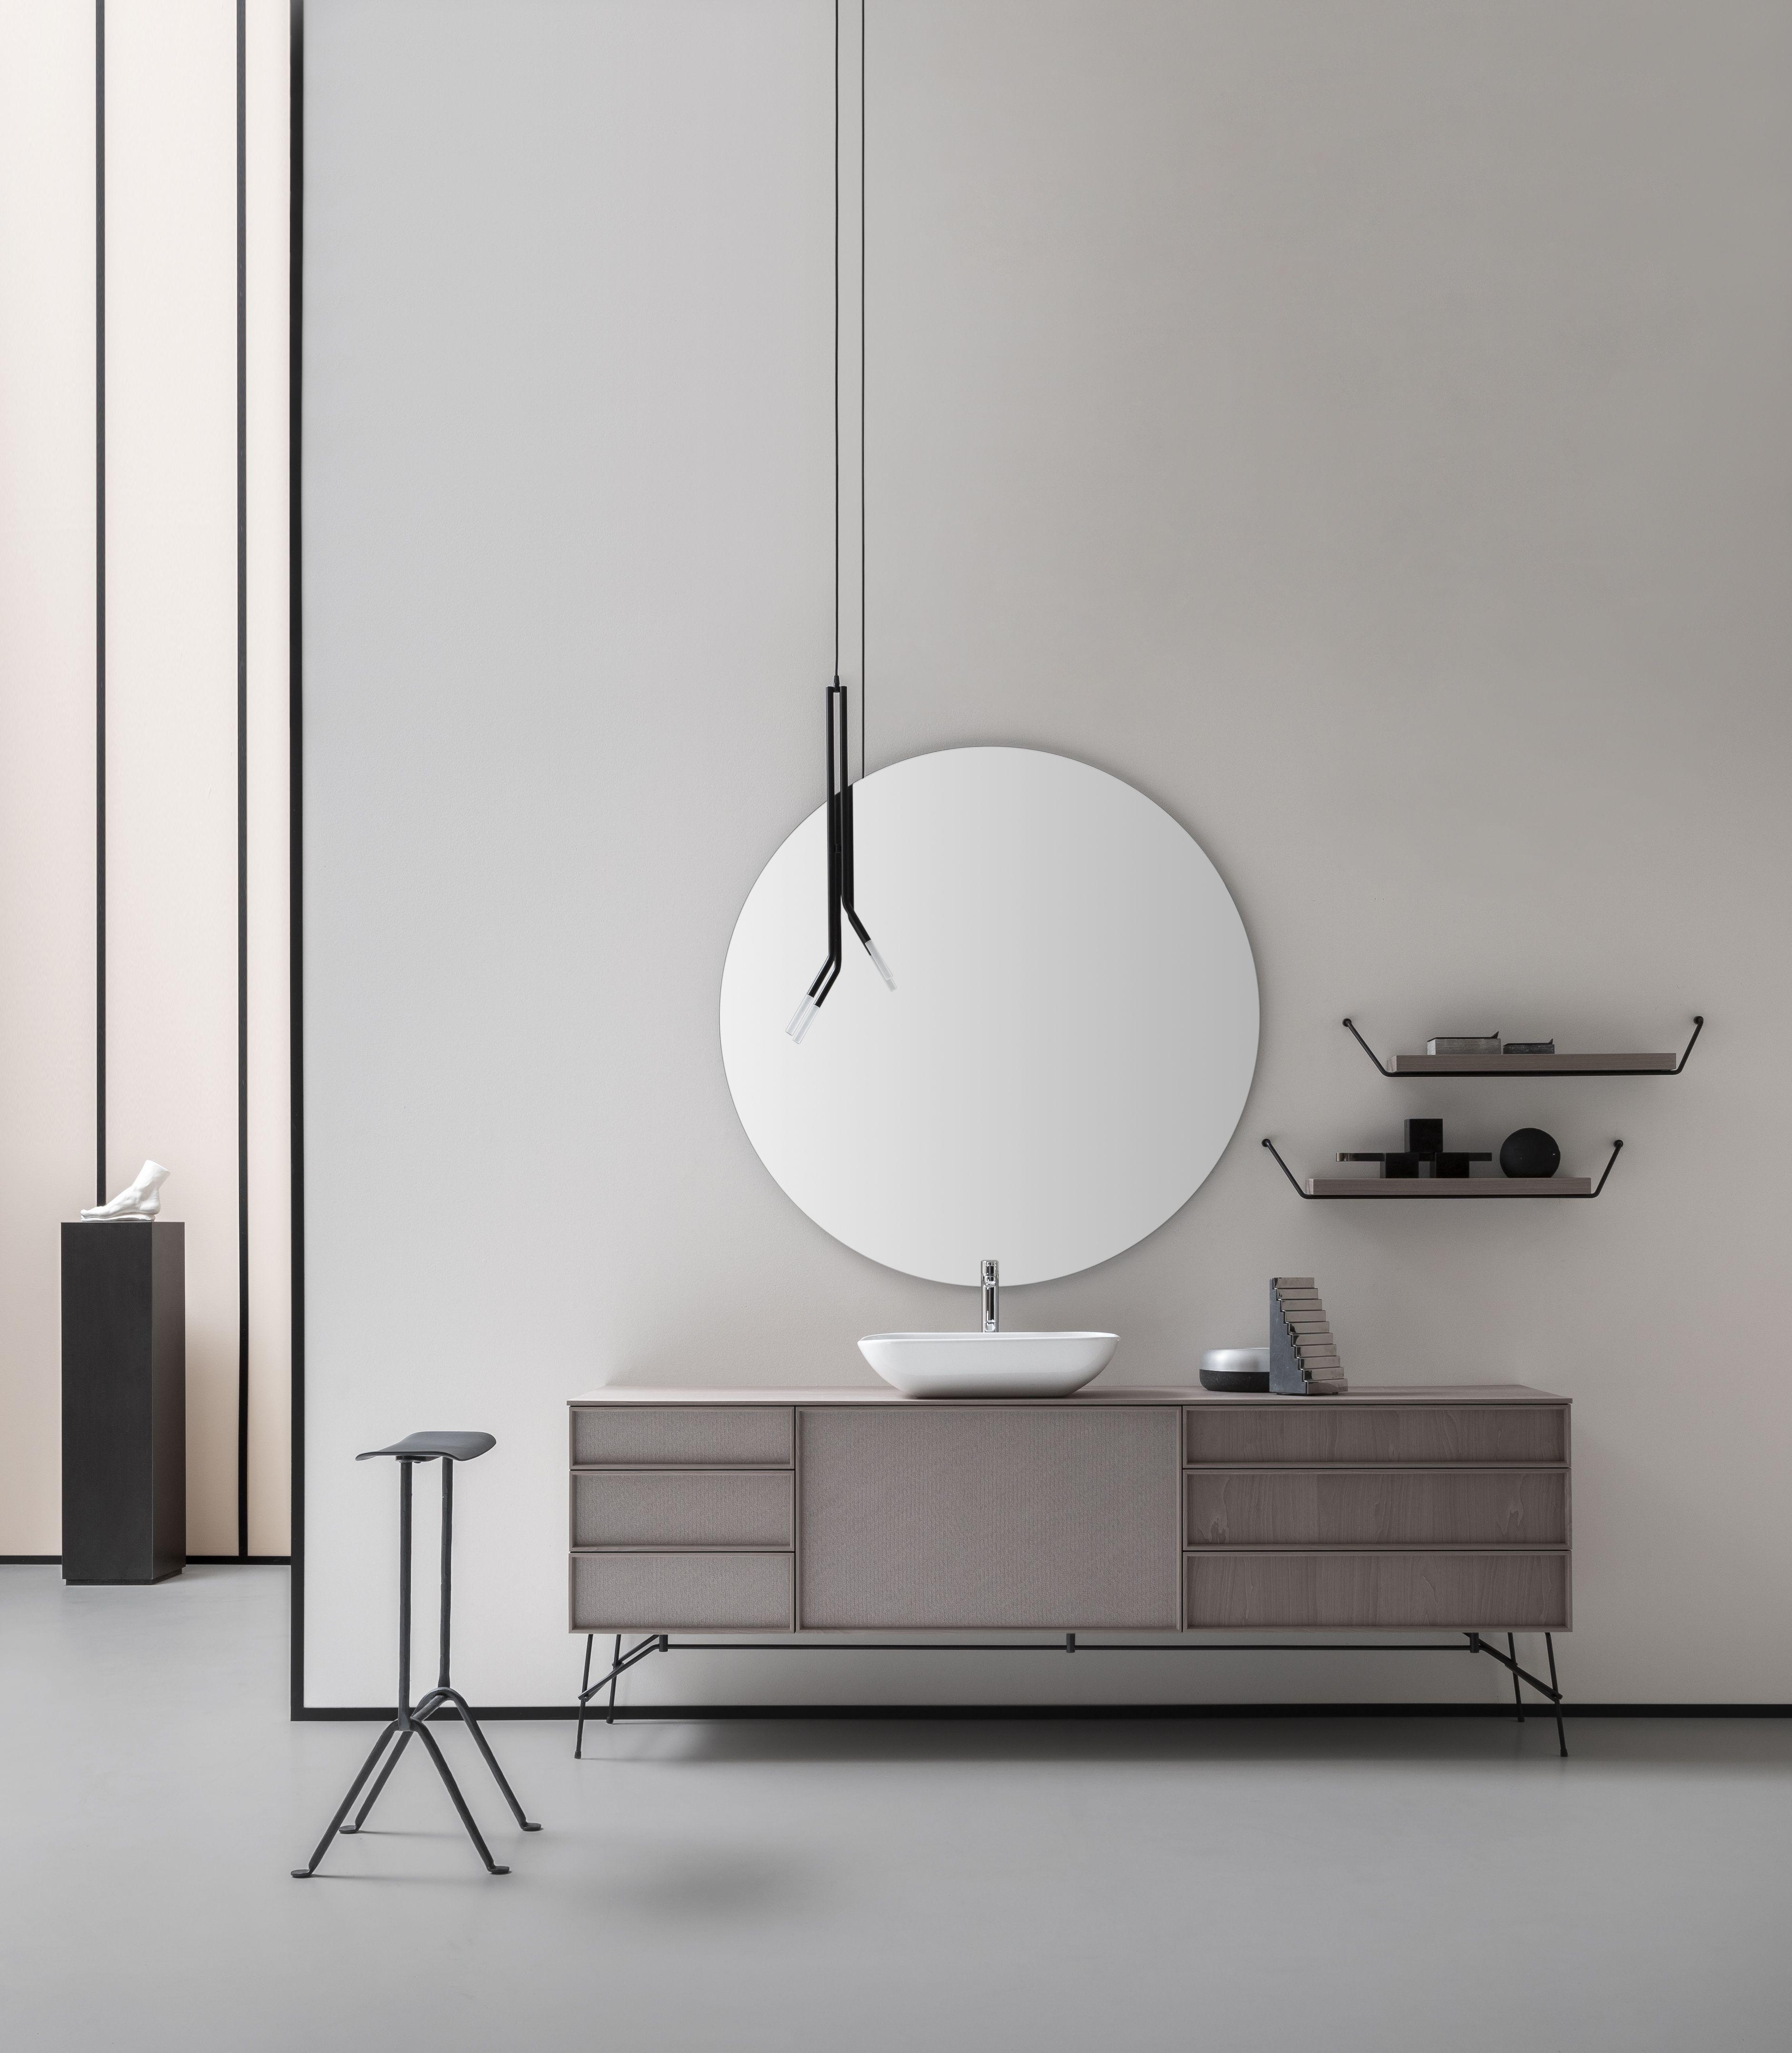 Ronan & Erwan Bouroullec officina bar stool, design ronan & erwan bouroullec, in the